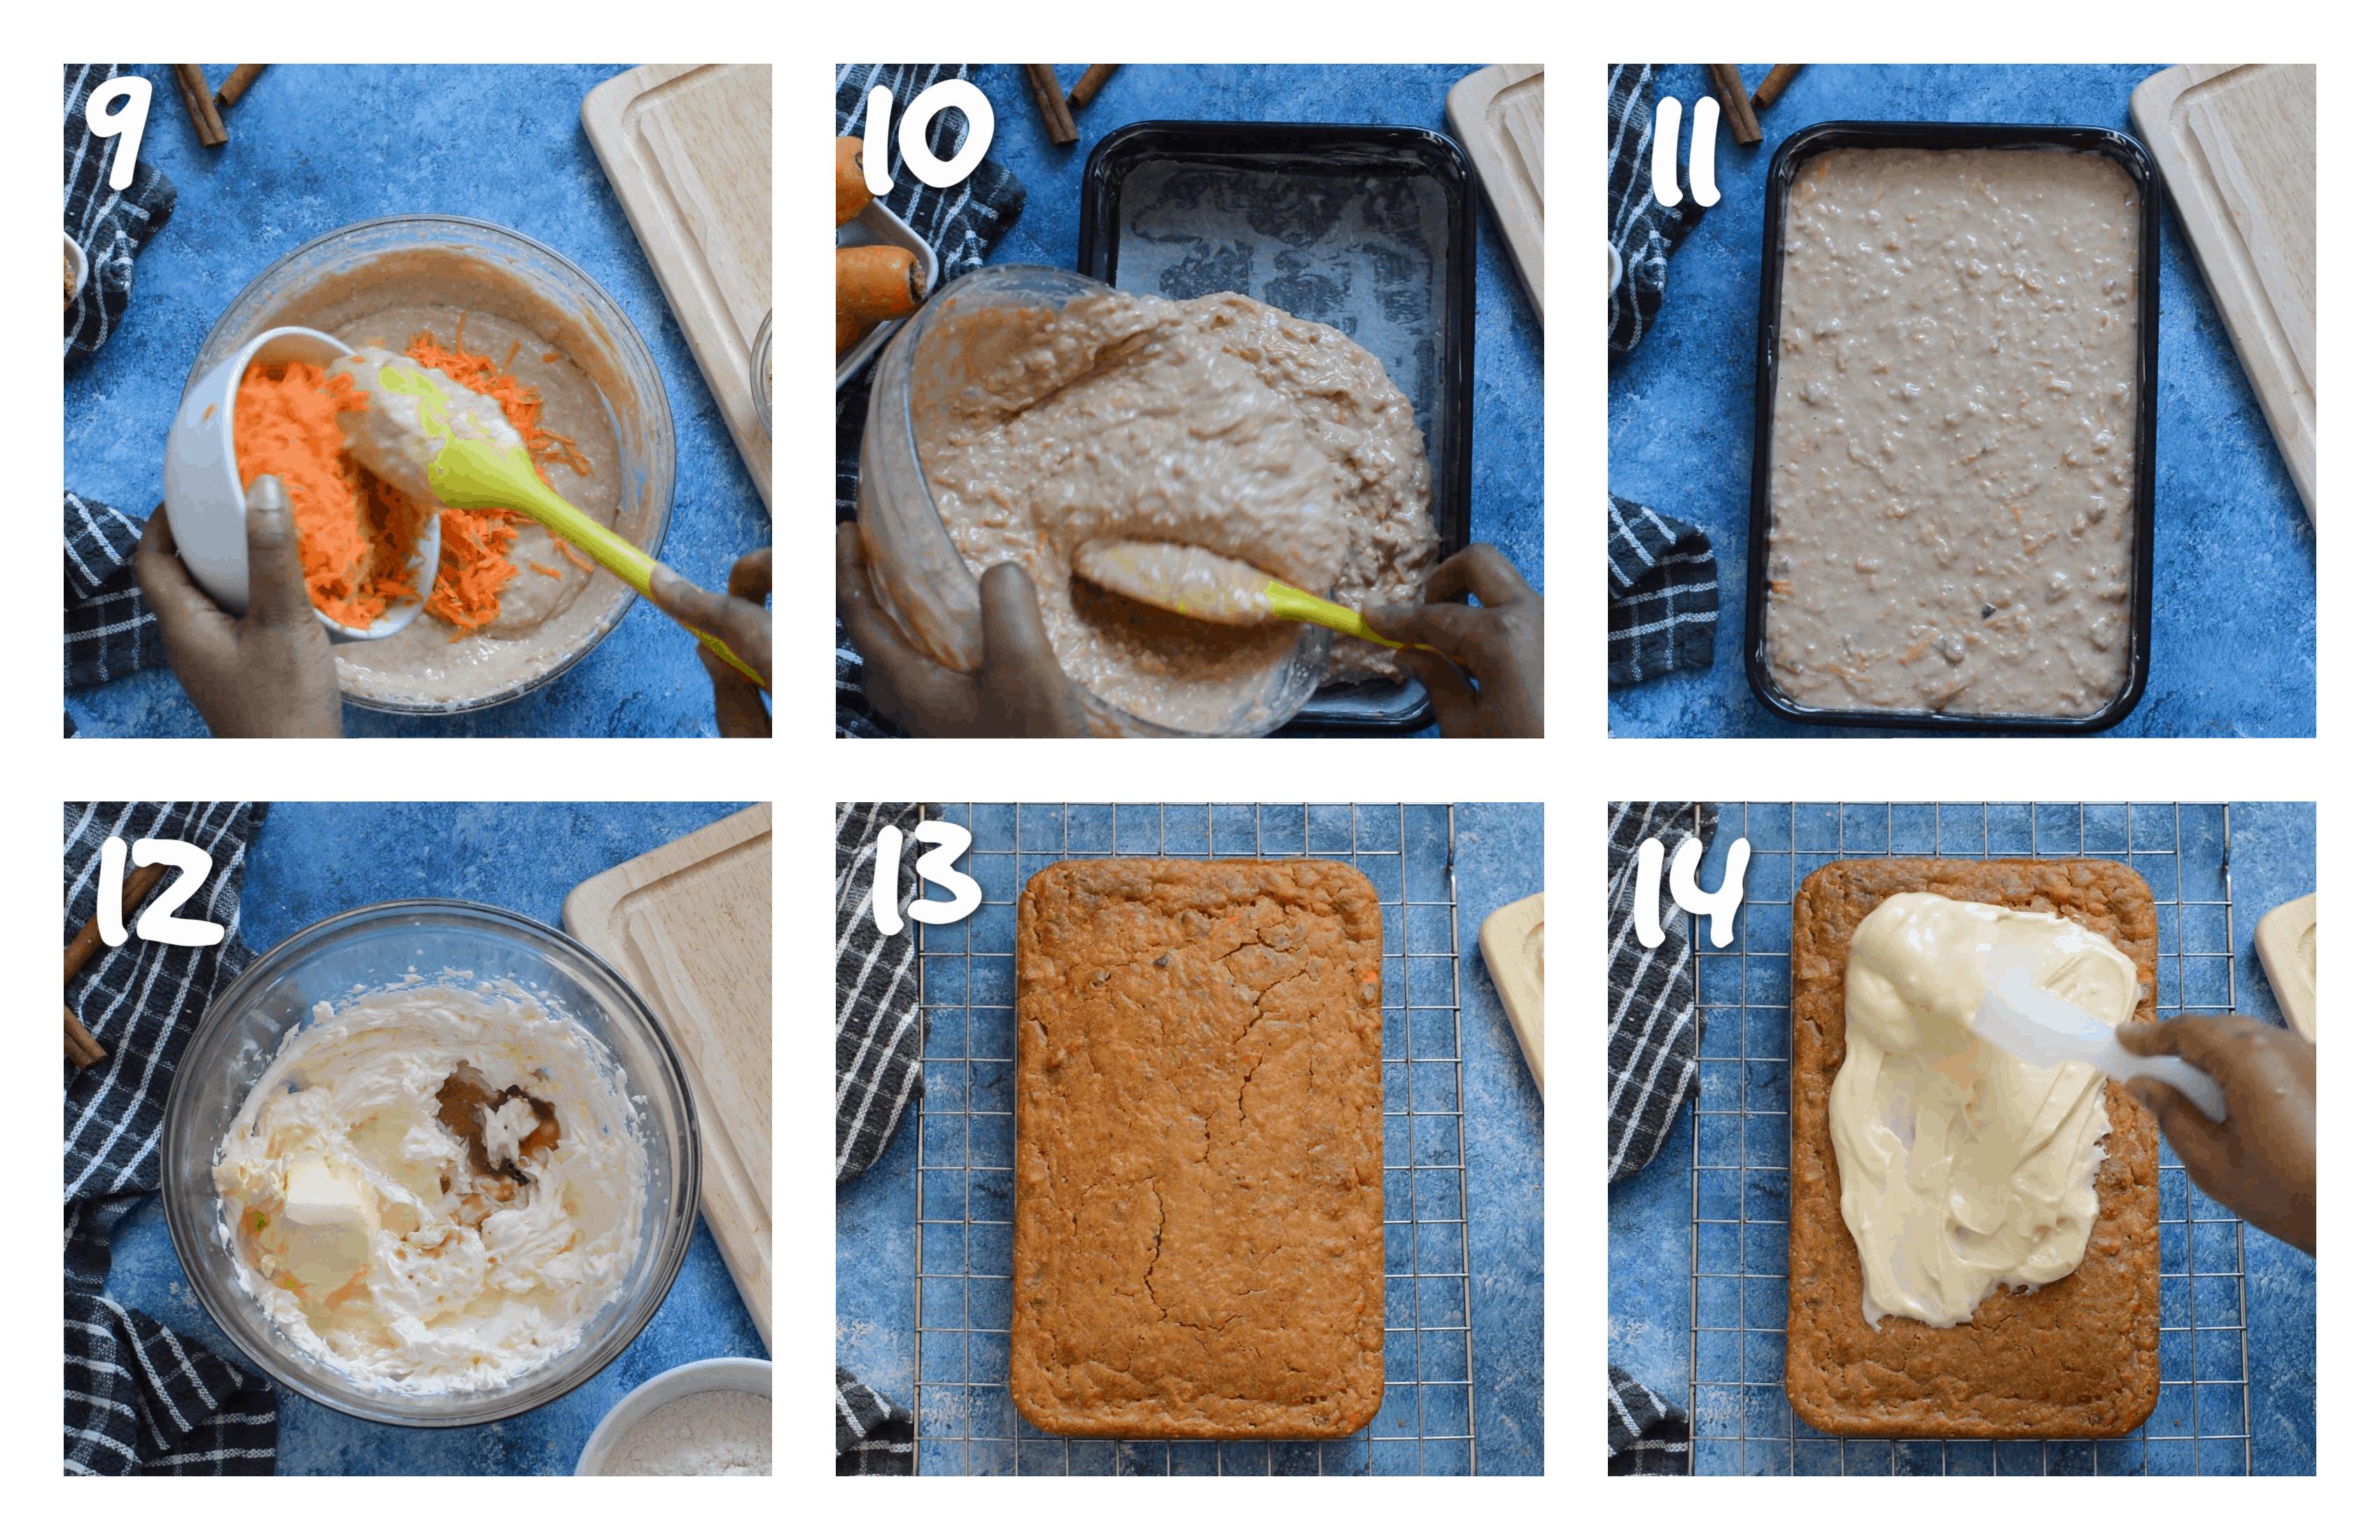 steps9-14 adding wet ingredients n bake cake